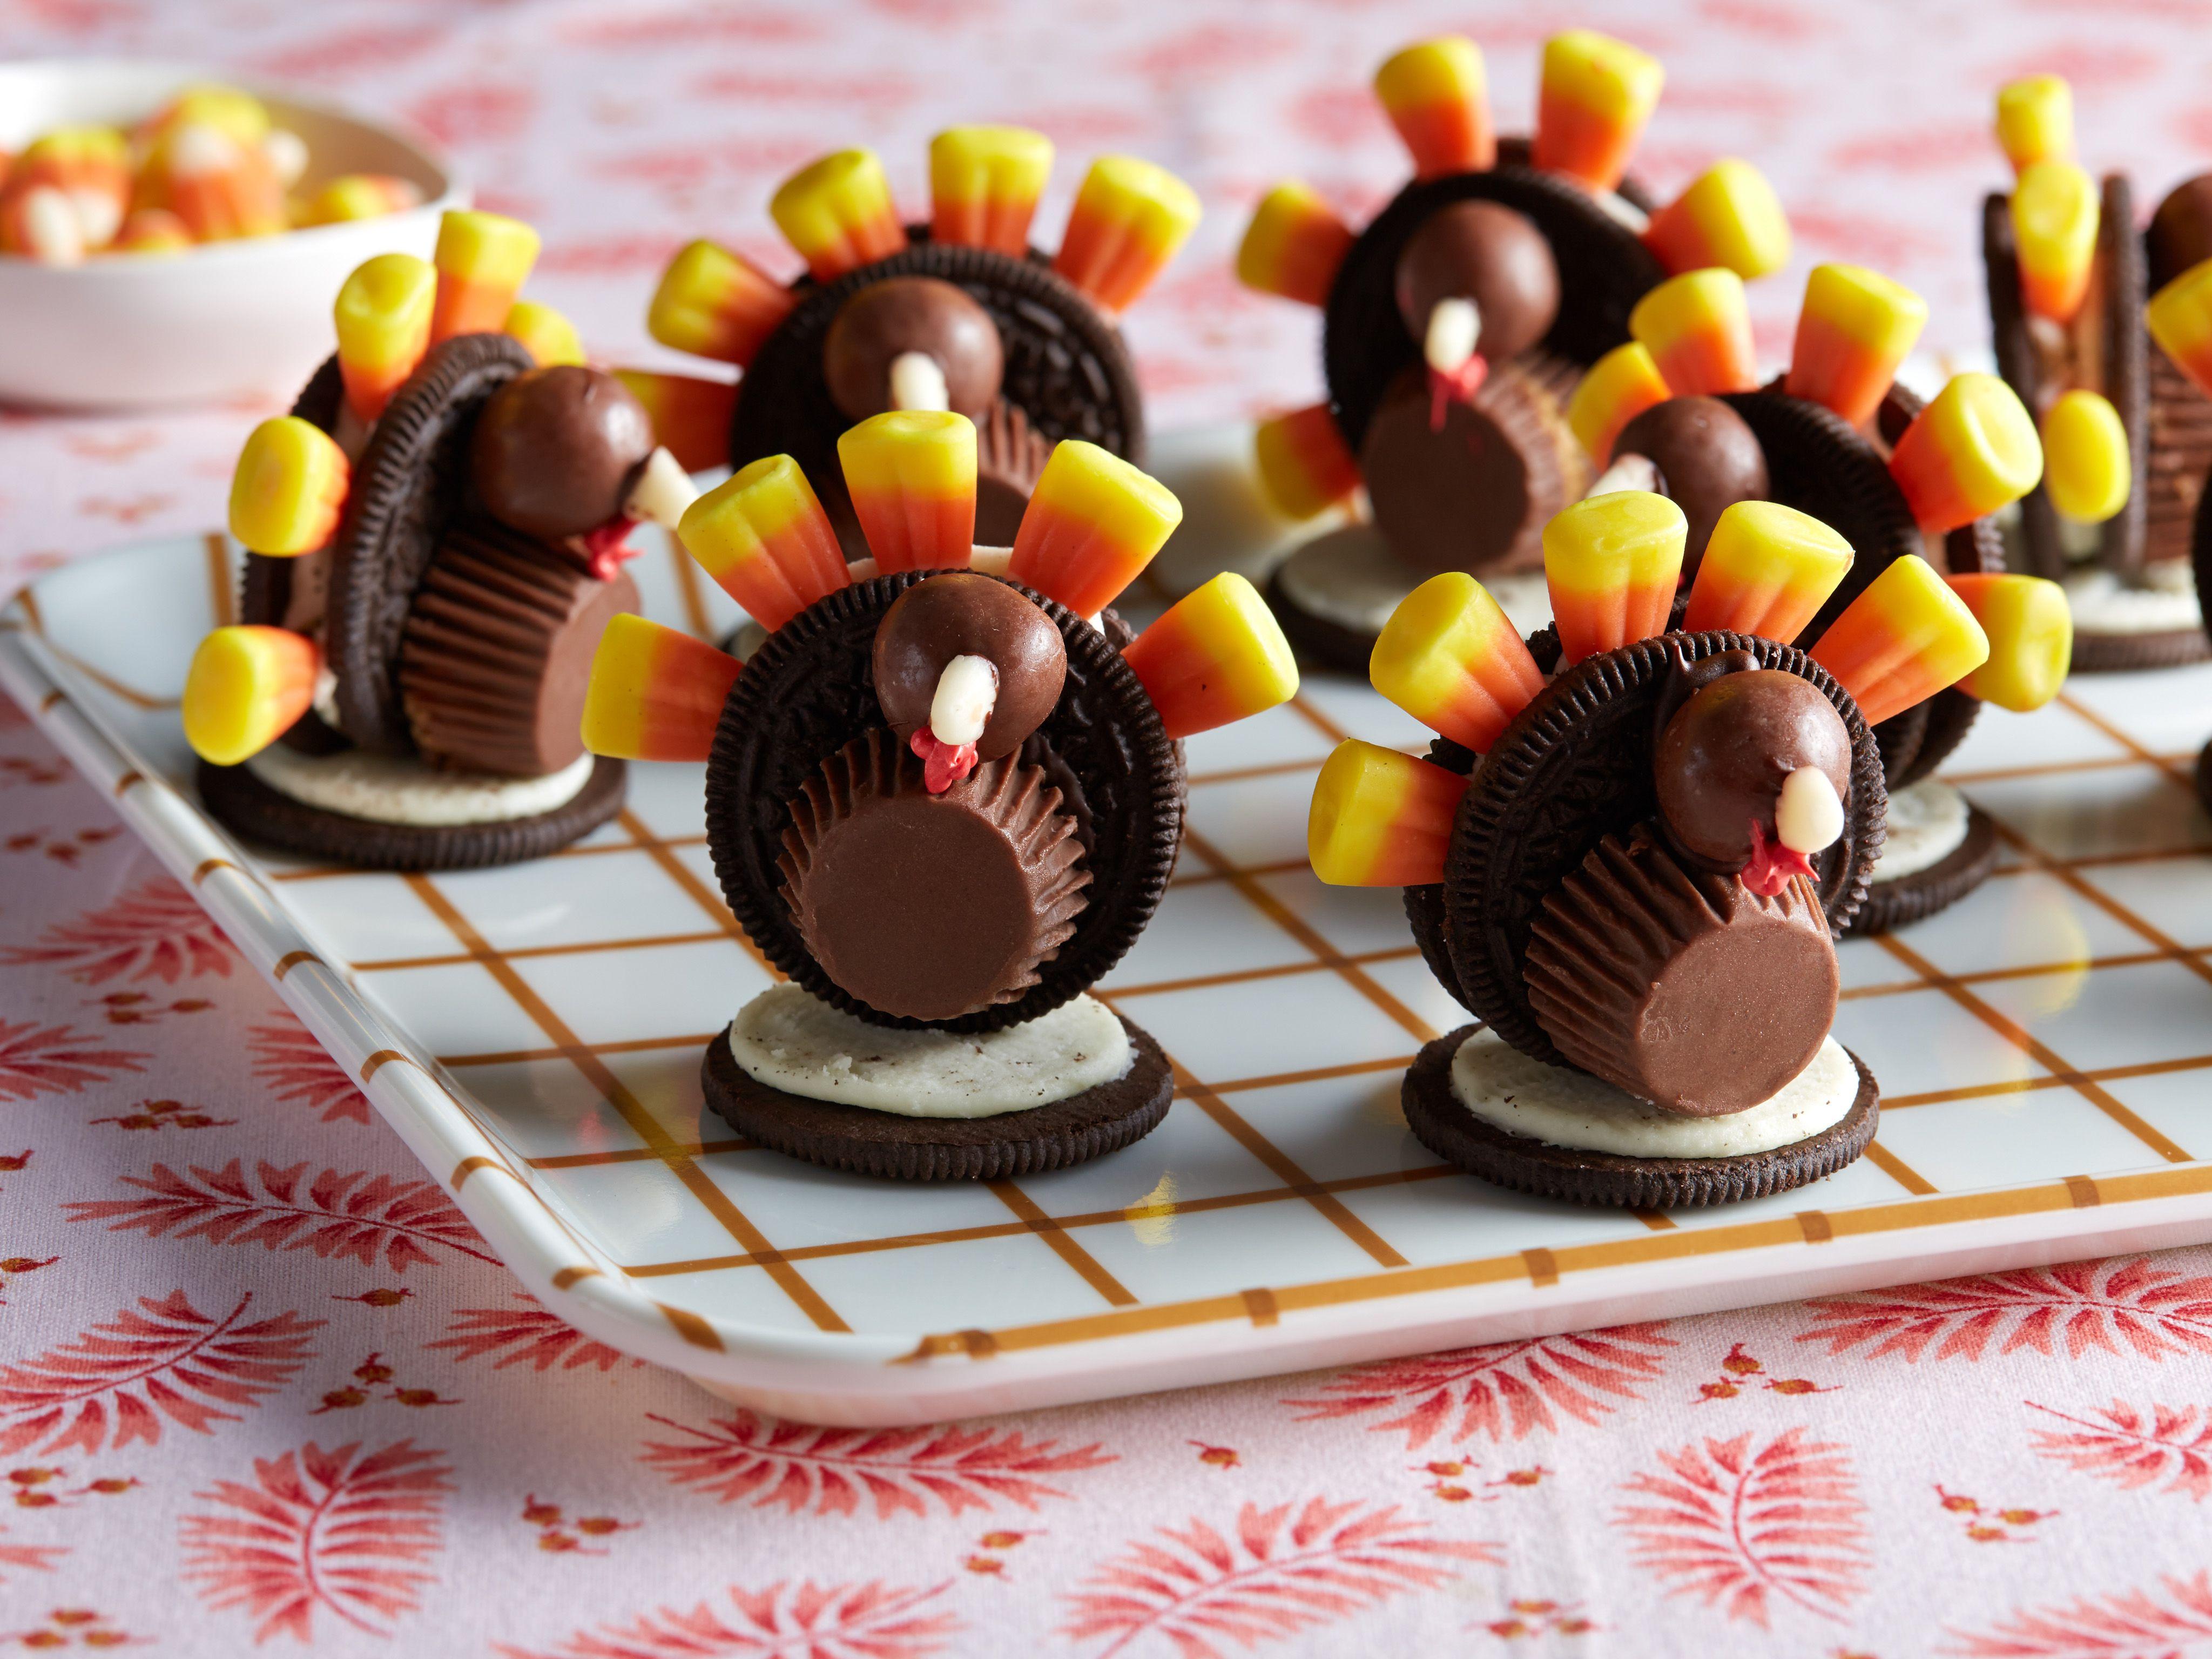 Thanksgiving turkeys recipe giada de laurentiis food network thanksgiving turkeys recipe giada de laurentiis food network forumfinder Gallery